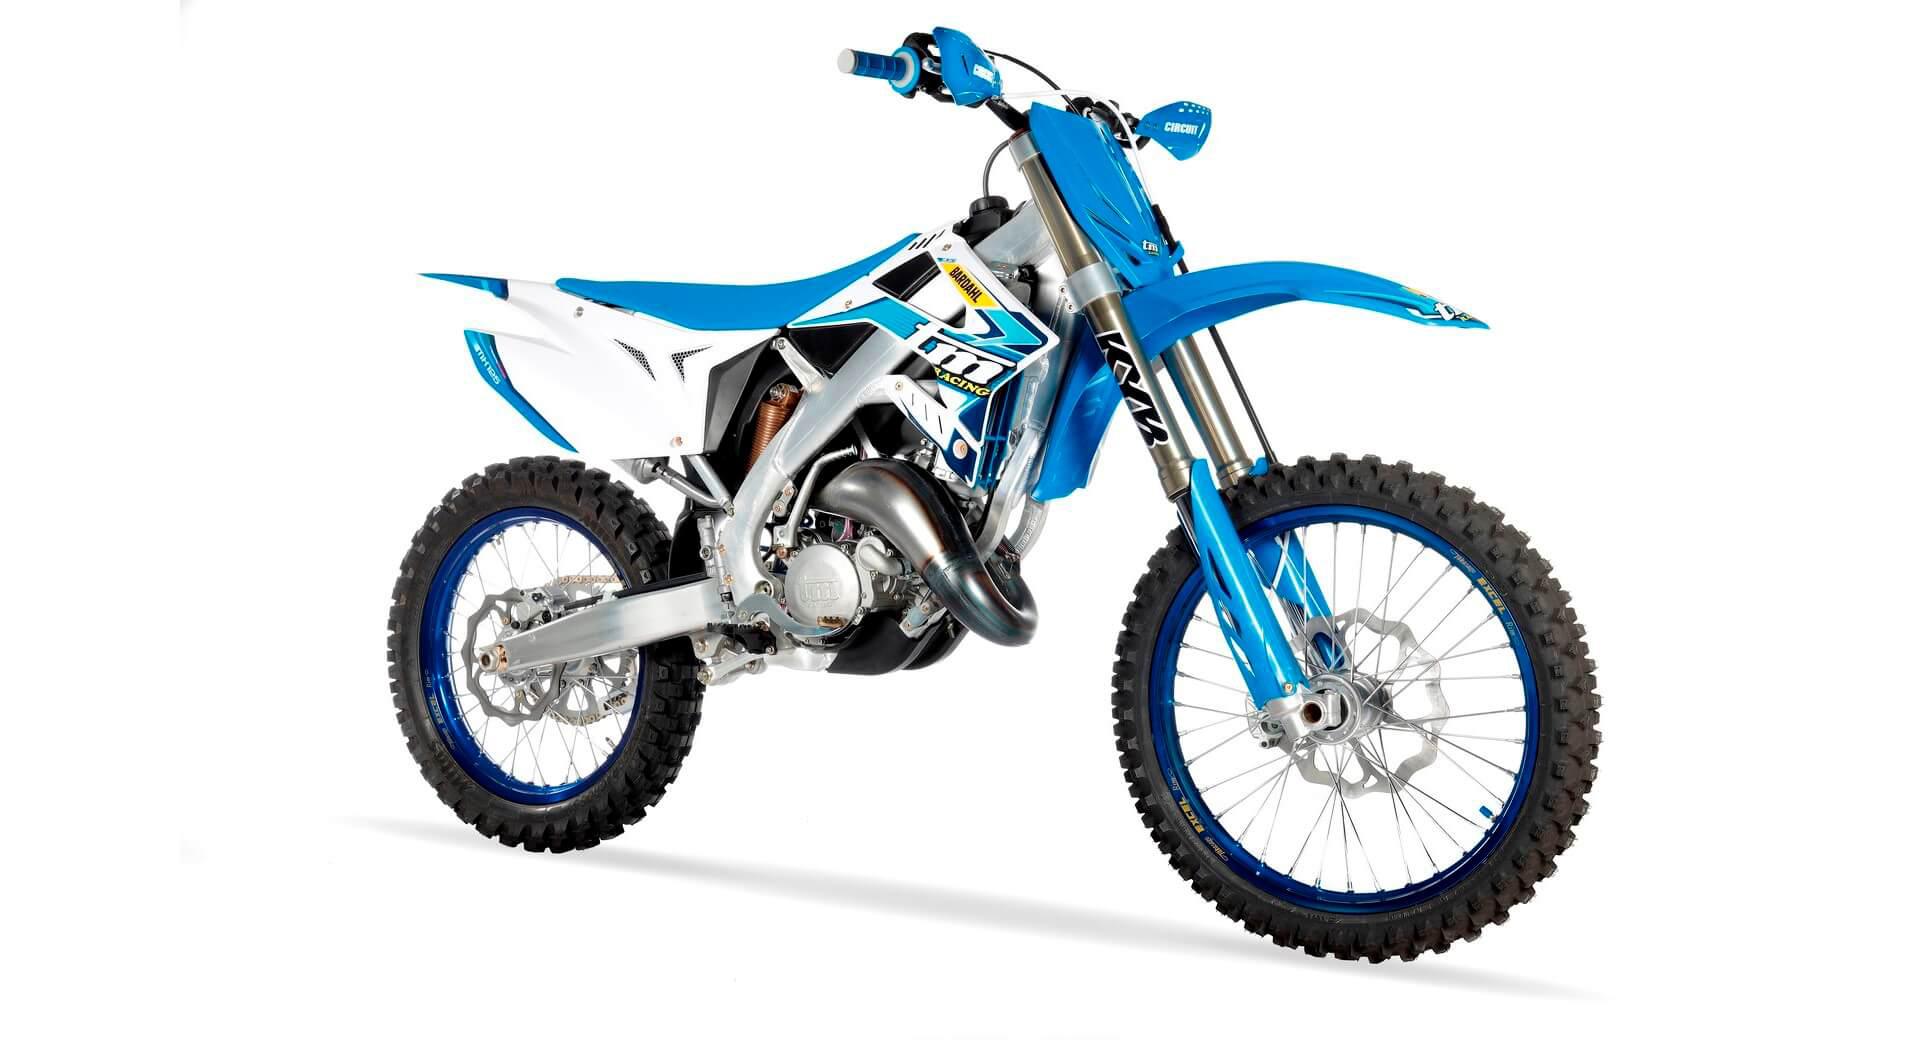 MX 125 2T 02